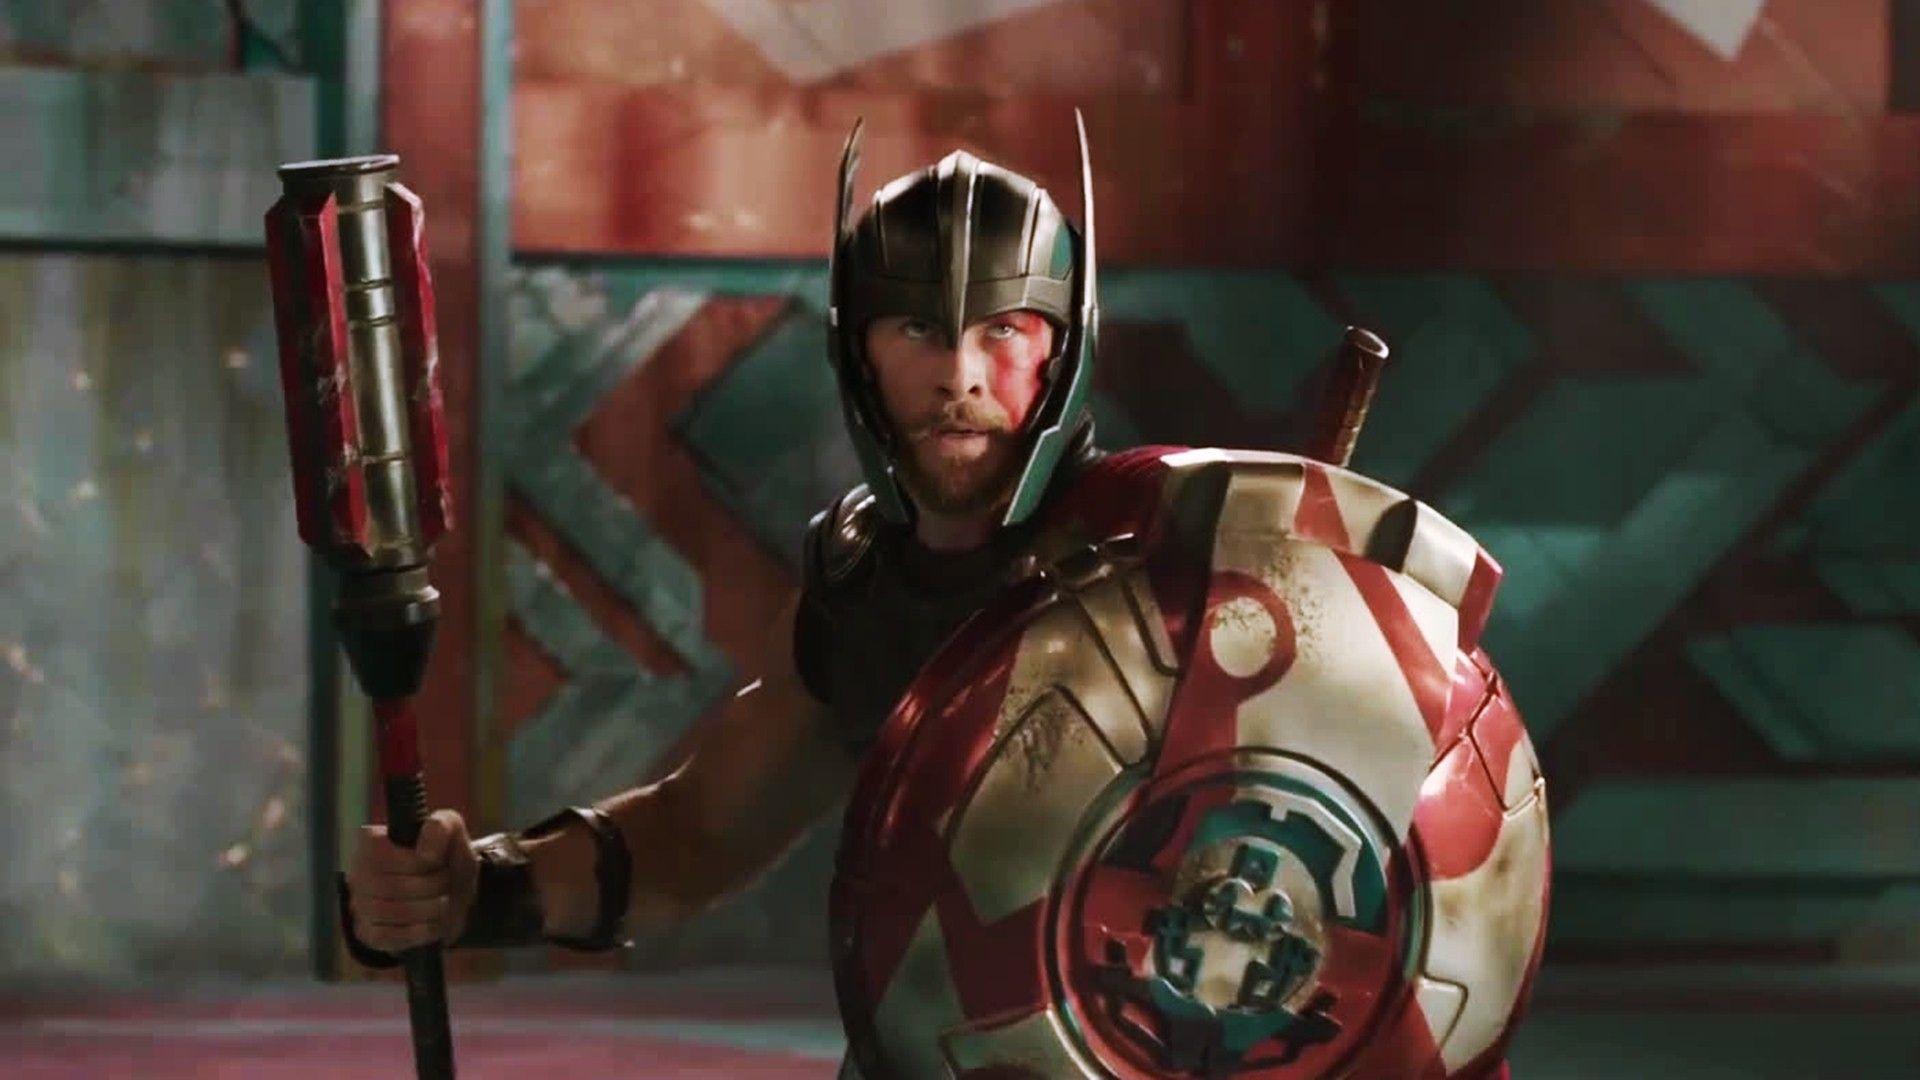 Thor Ragnarok HD Images 1 whb #ThorRagnarokHDImages #ThorRagnarok #movies #wallpapers #hdwallpapers | Thor ragnarok full movie, Thor, Marvel avengers movies